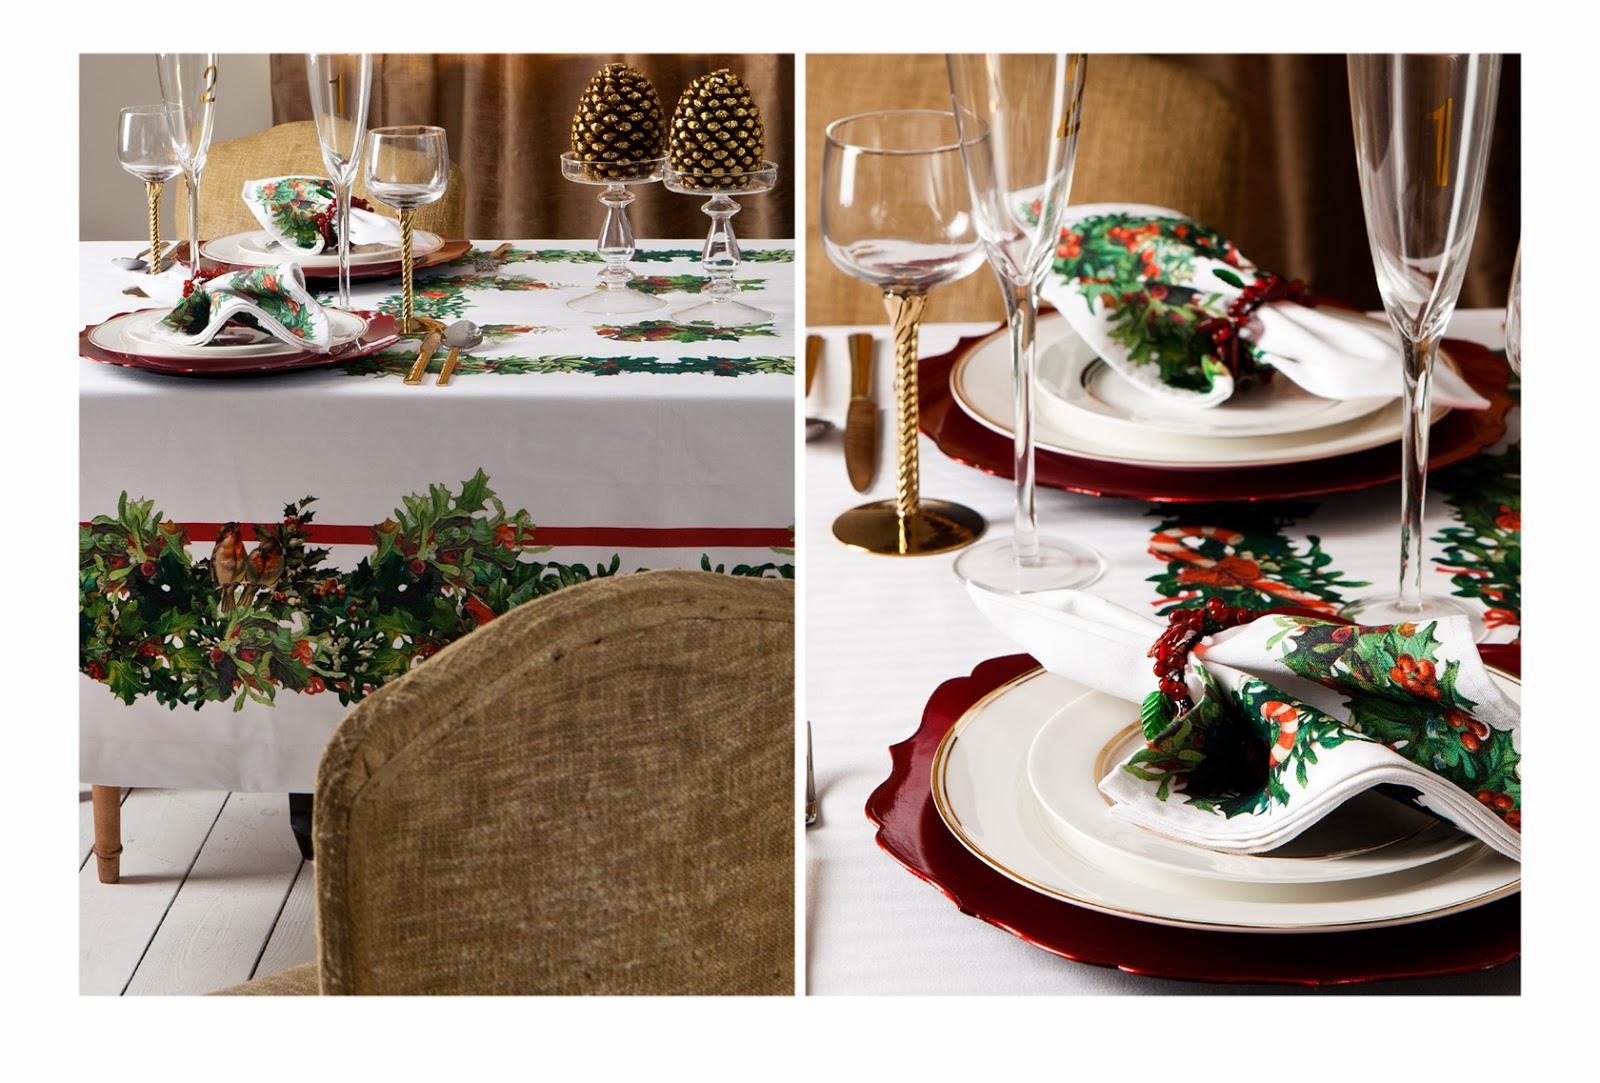 Home & Lifestyle|: Especial de Navidad, ZARA Home, Decoración para ...